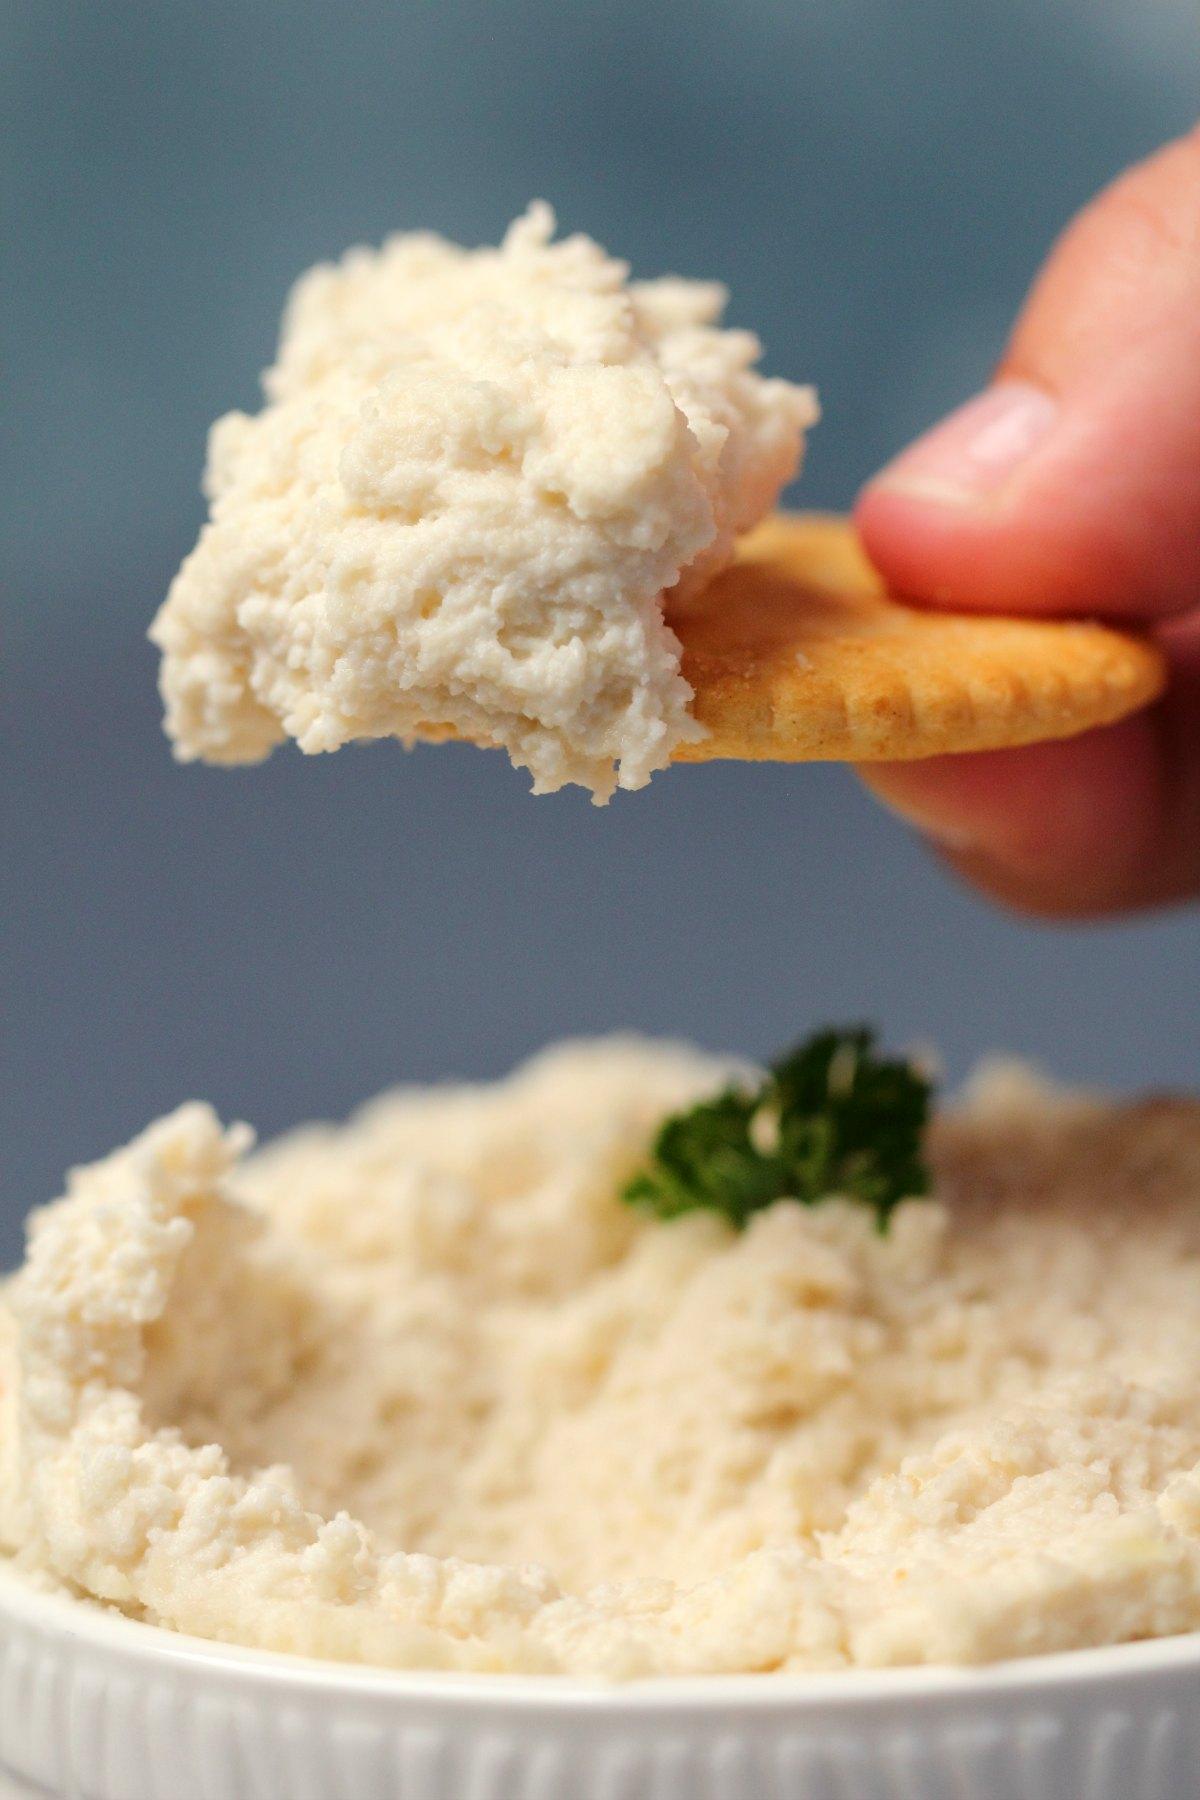 Vegan ricotta on a cracker.